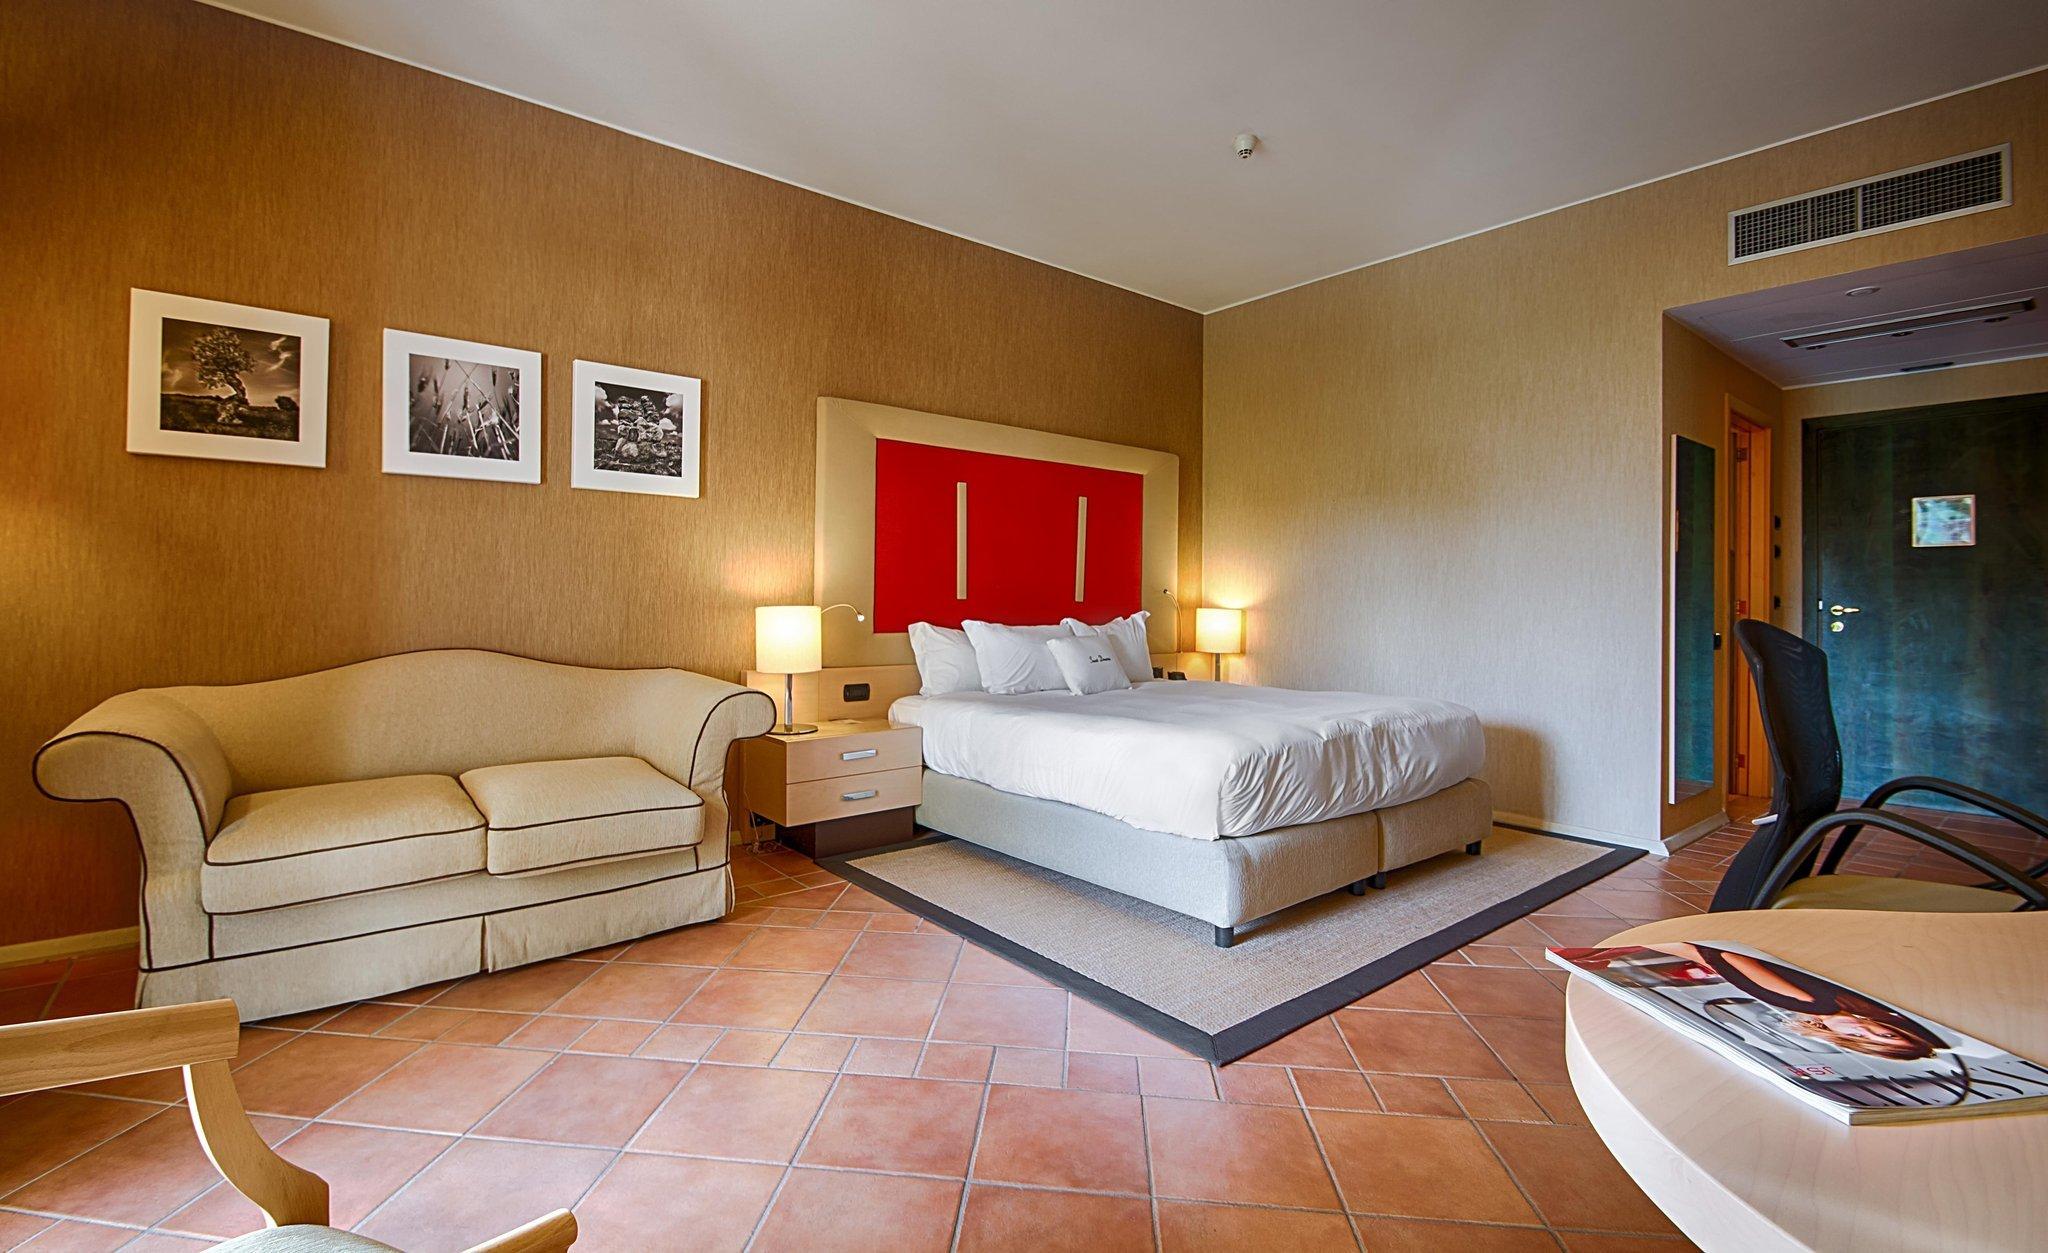 DoubleTree by Hilton Acaya Golf Resort-Lecce